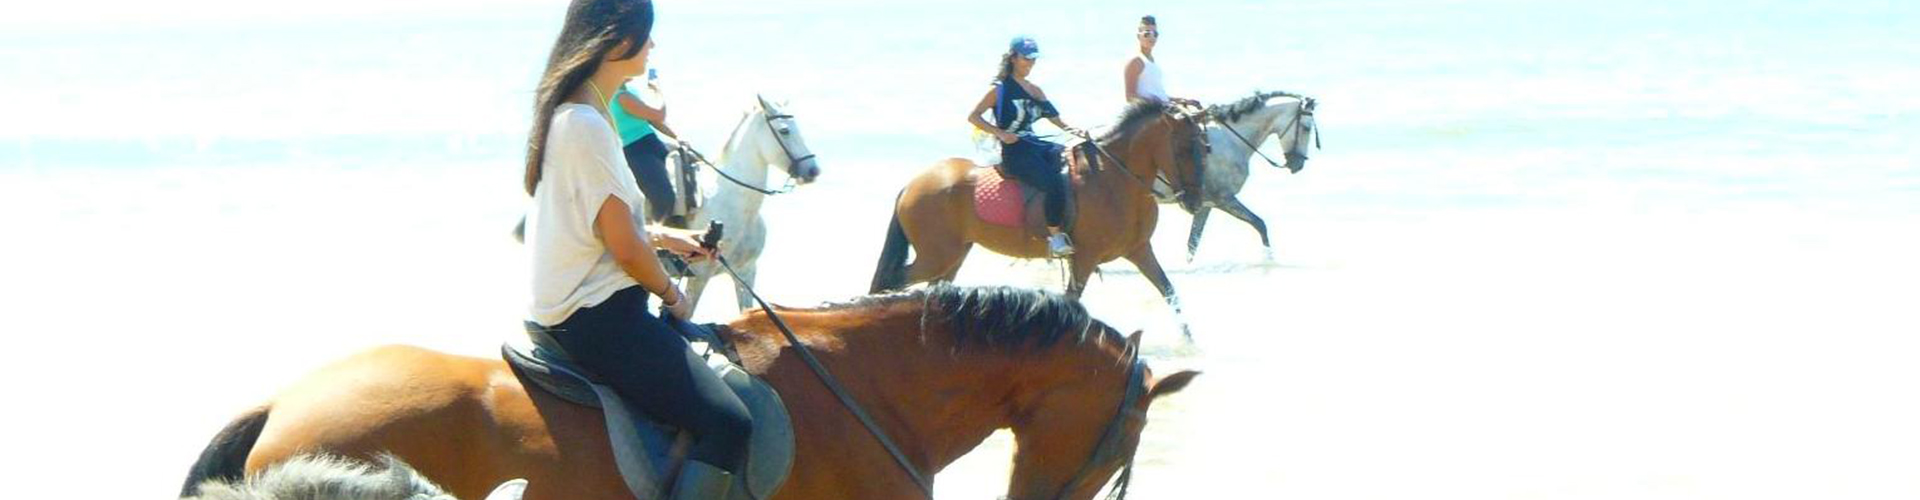 Hotel Mazagonia. Paseo a caballo por la playa.